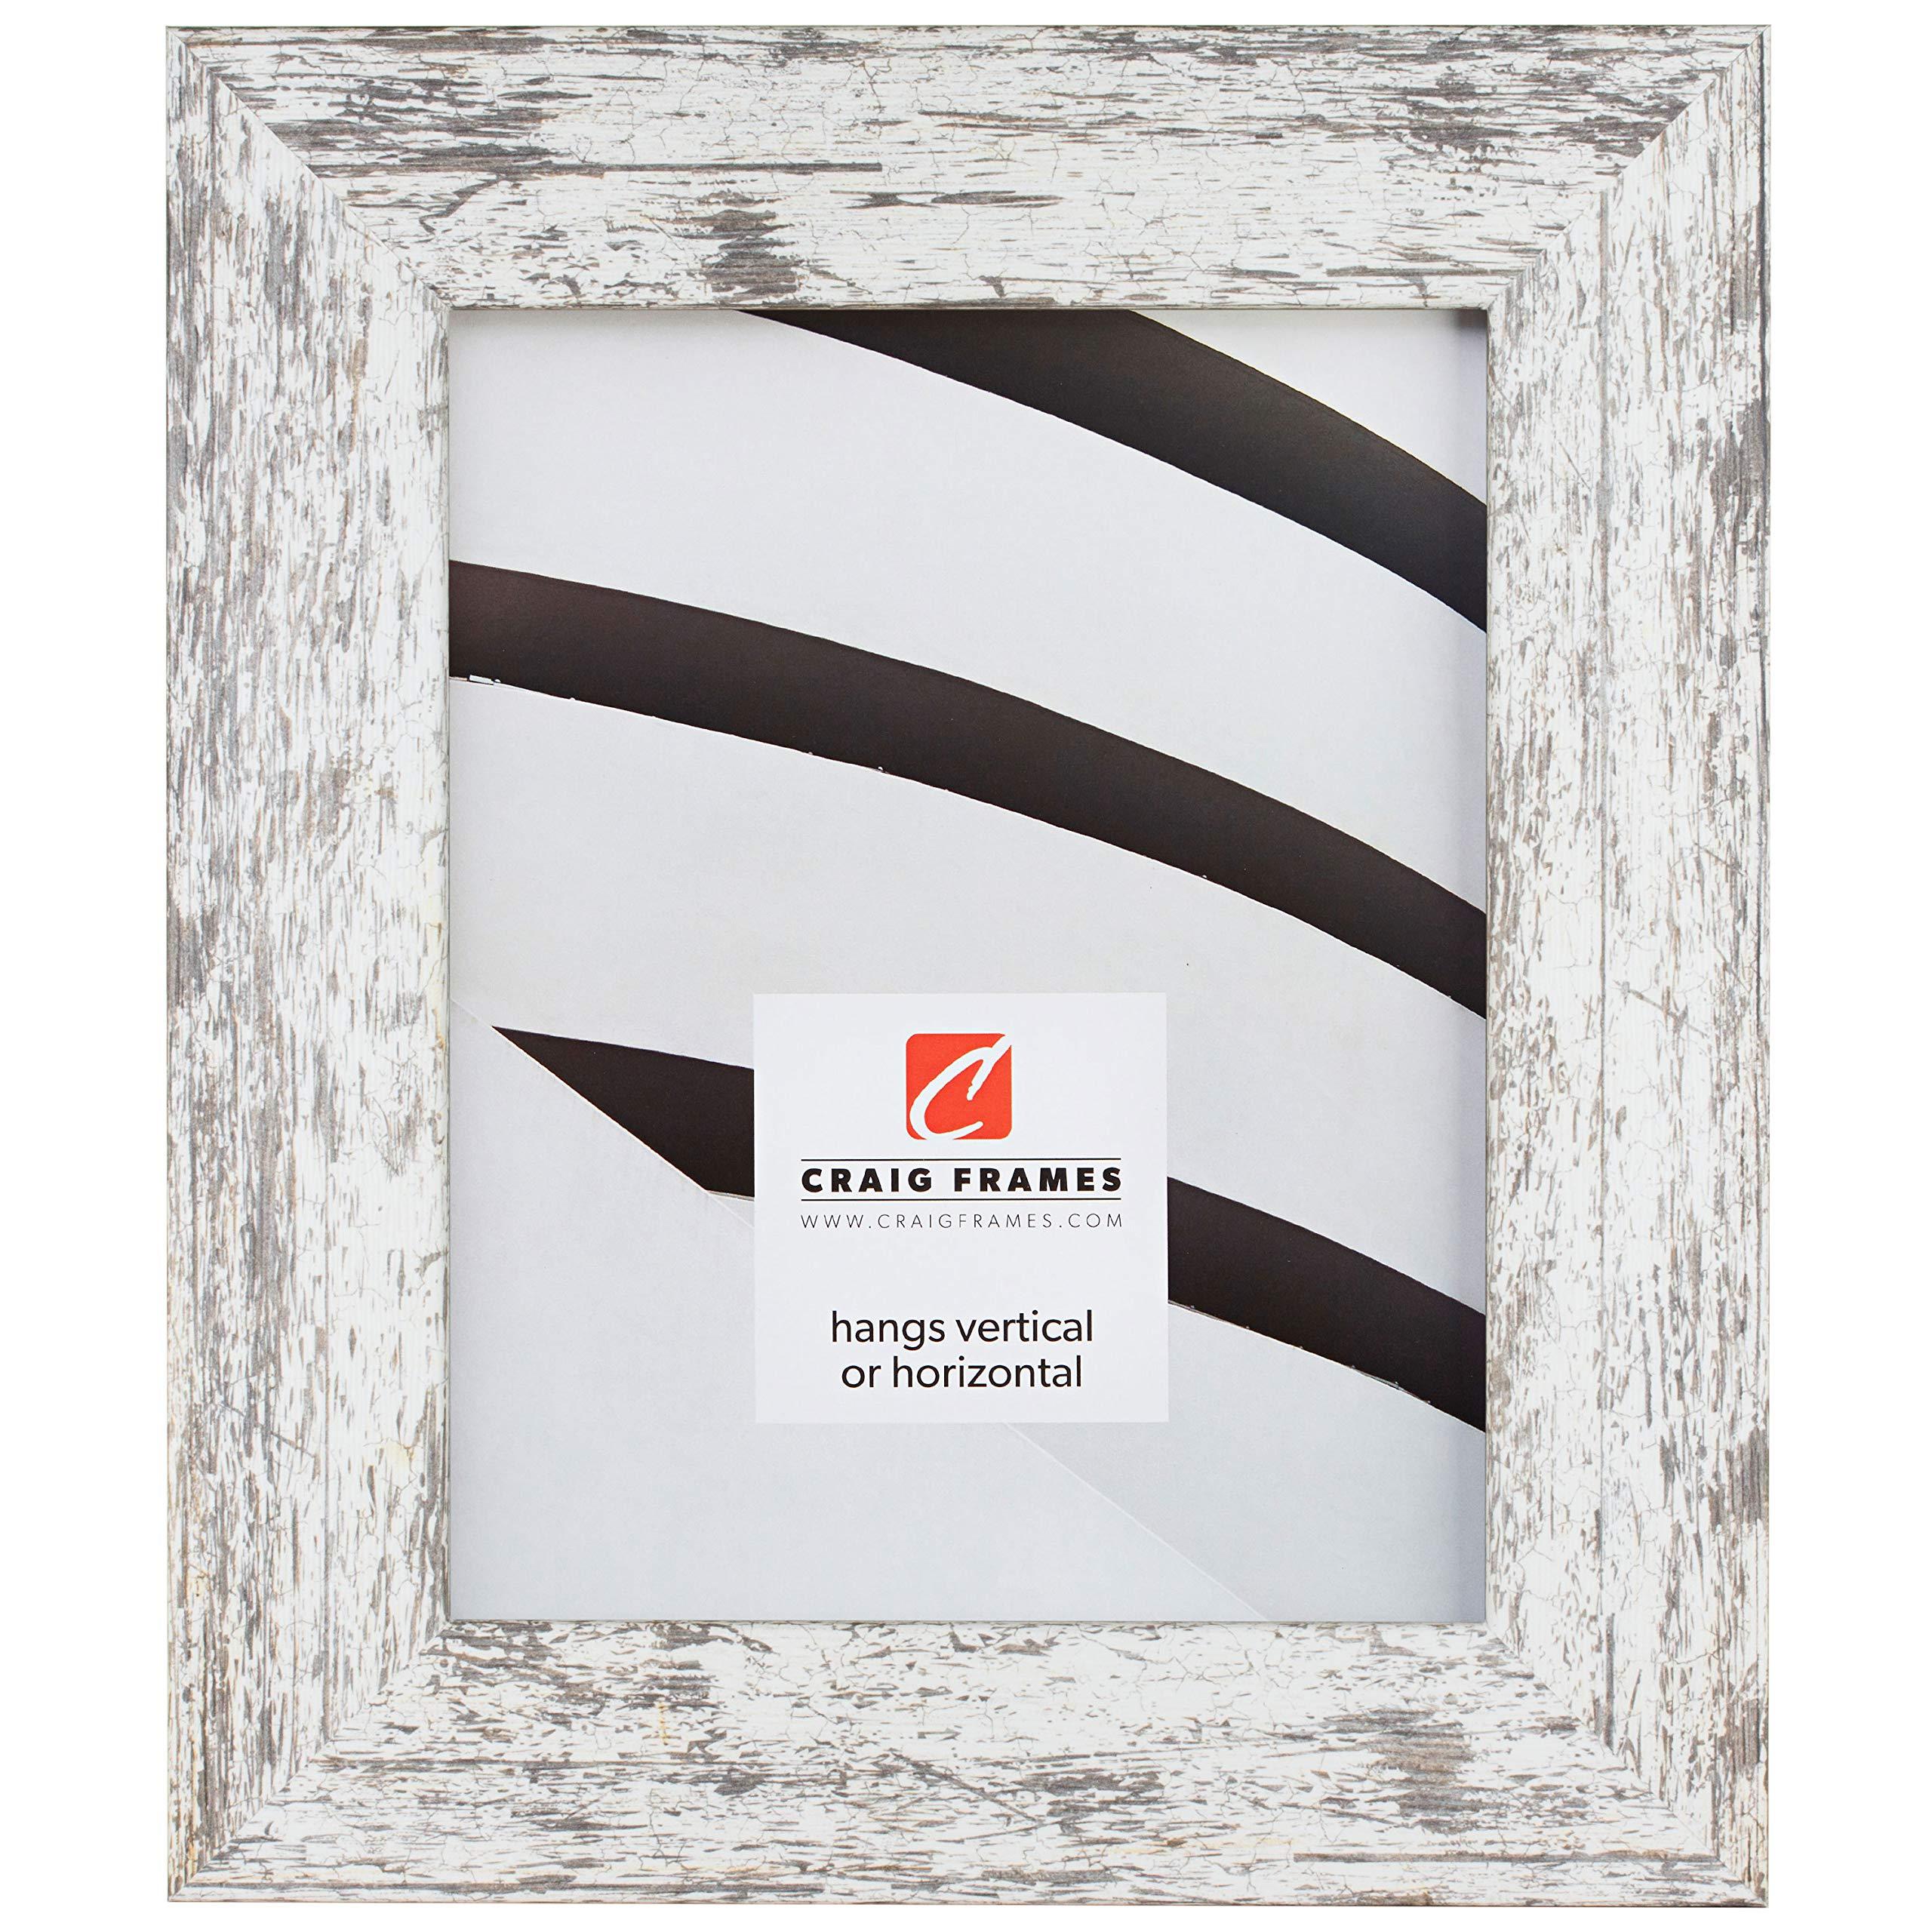 Craig Frames American Barn, Faux Barnwood Picture Frame, White, 16 x 20 Inch by Craig Frames